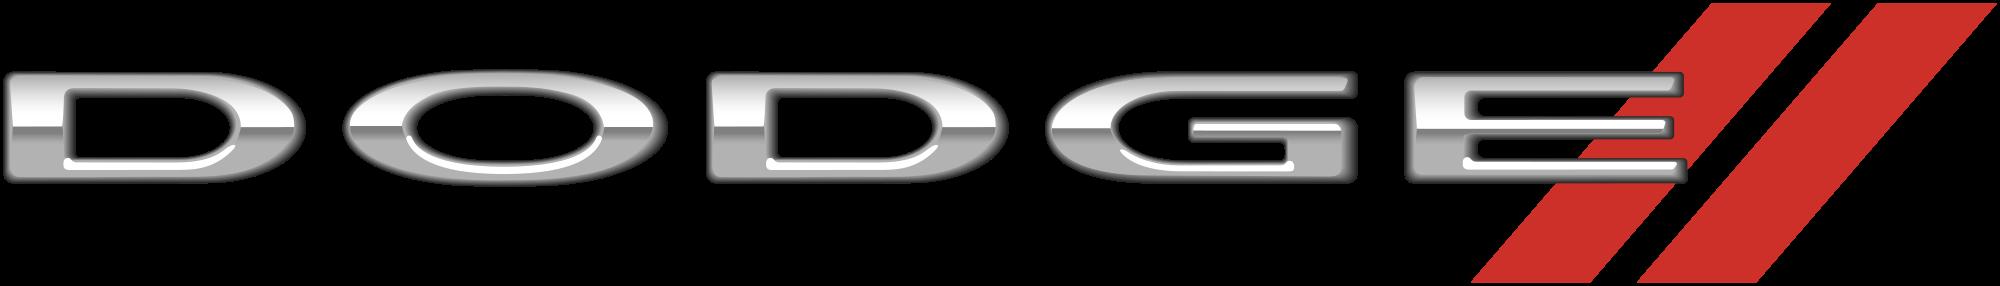 New_Dodge_logo